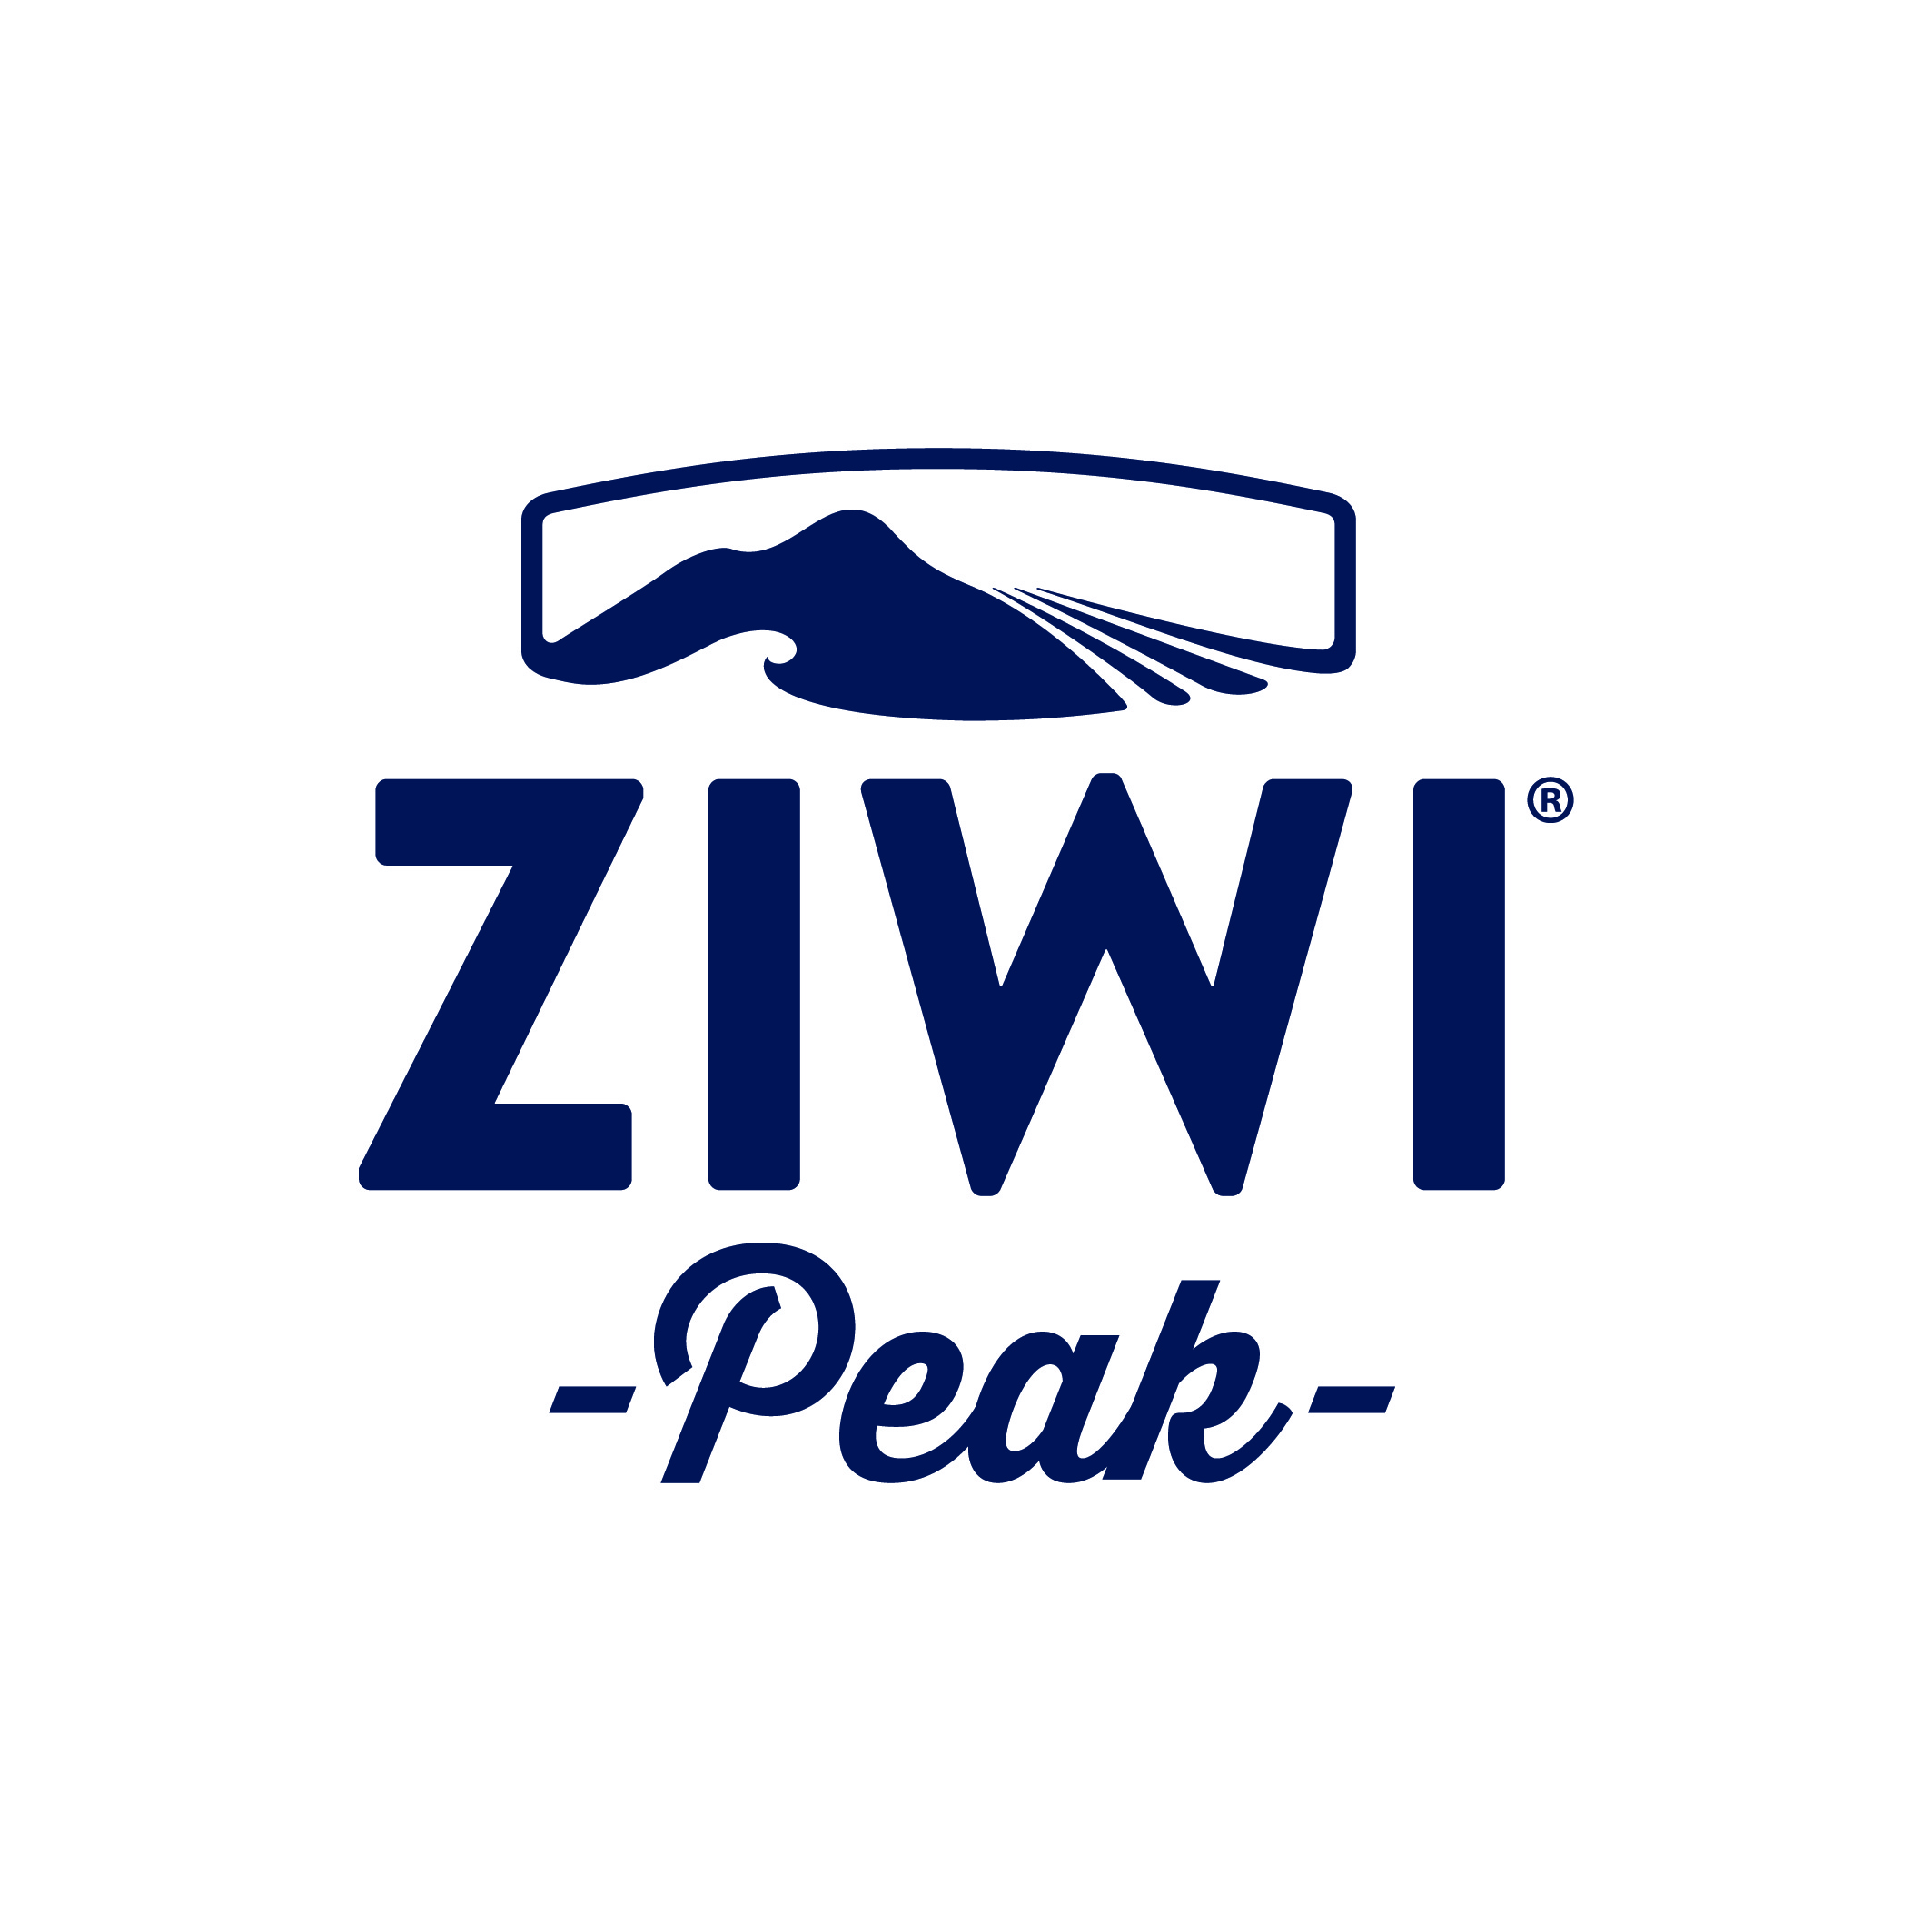 ZIWIブランド輸入・販売代理店変更のお知らせのアイキャッチ